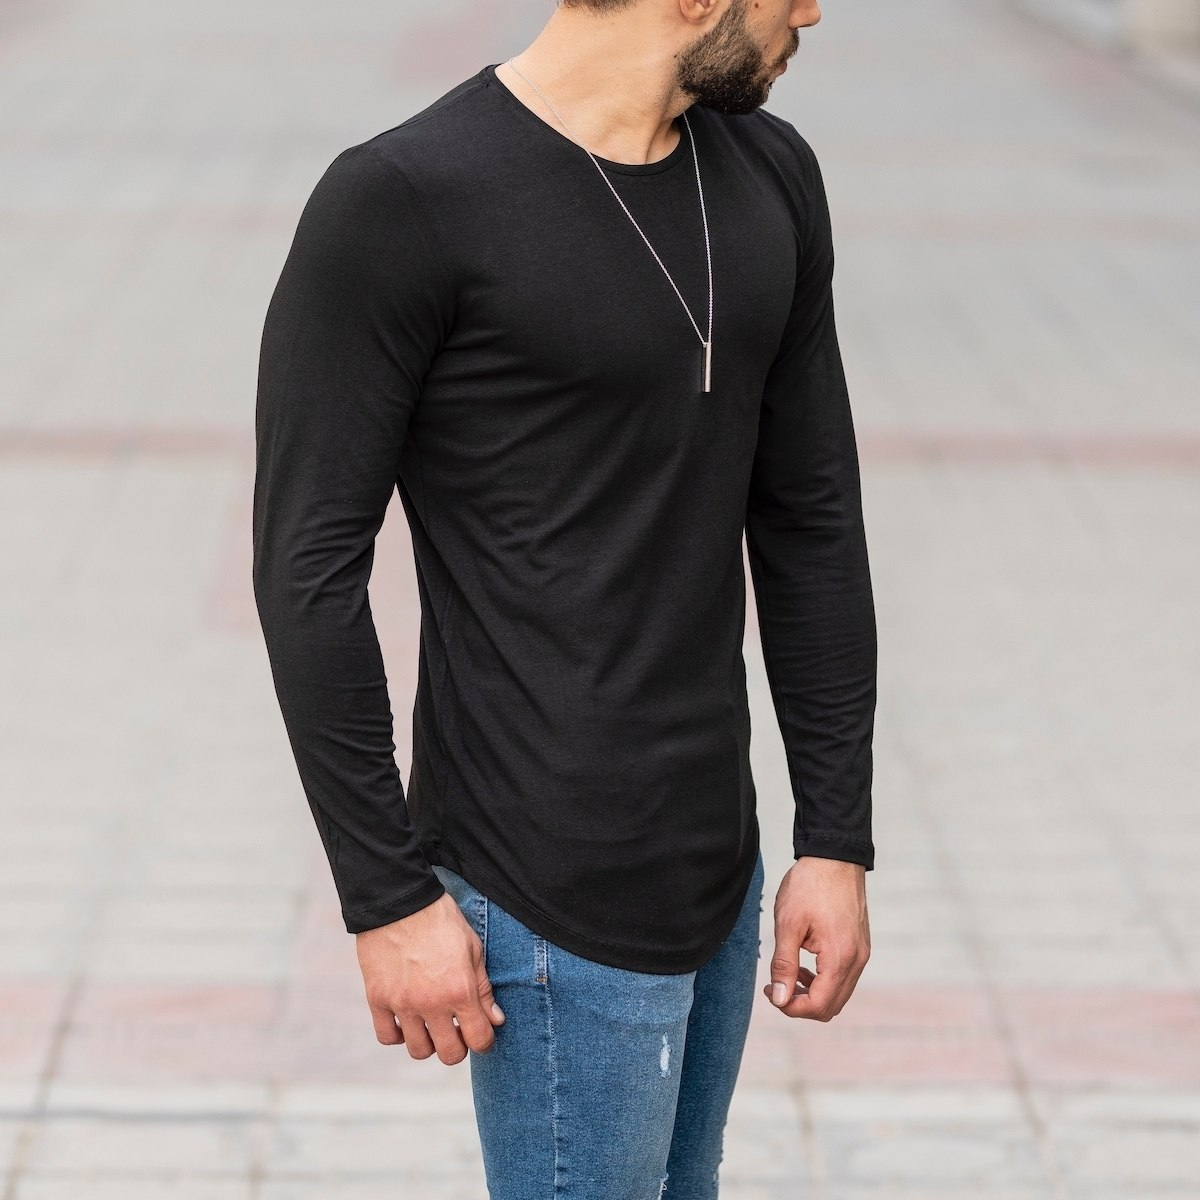 Basic Sweatshirt In Black